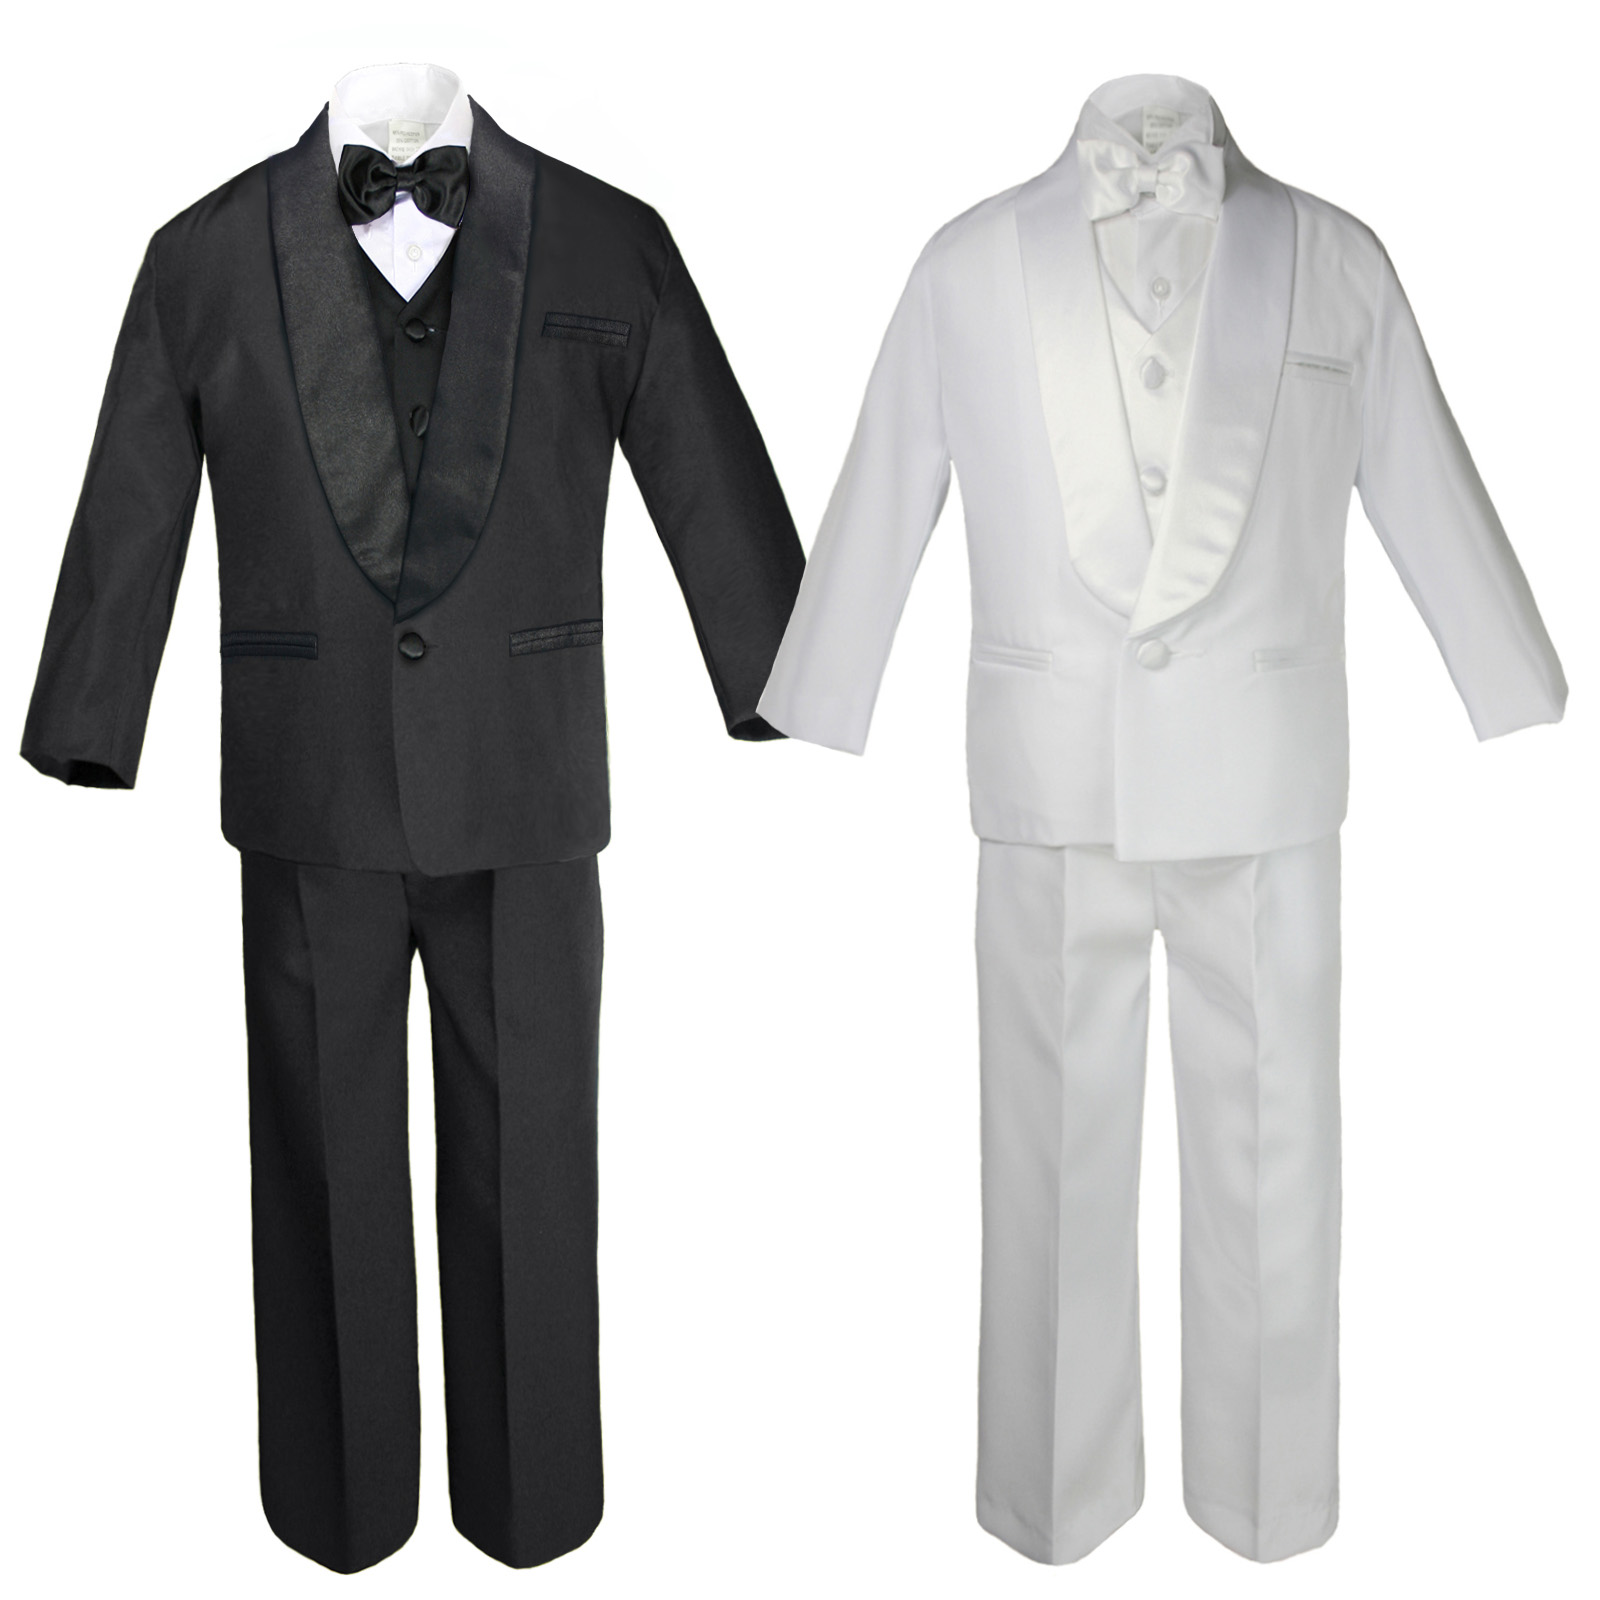 78170e8f44e0 Suits & Sport Coats Clothing Baby Kids Child Kid Toddler Boy Teen Formal  Wedding Party White Suit Tuxedo Set Orange Satin Vest Bow Tie ...